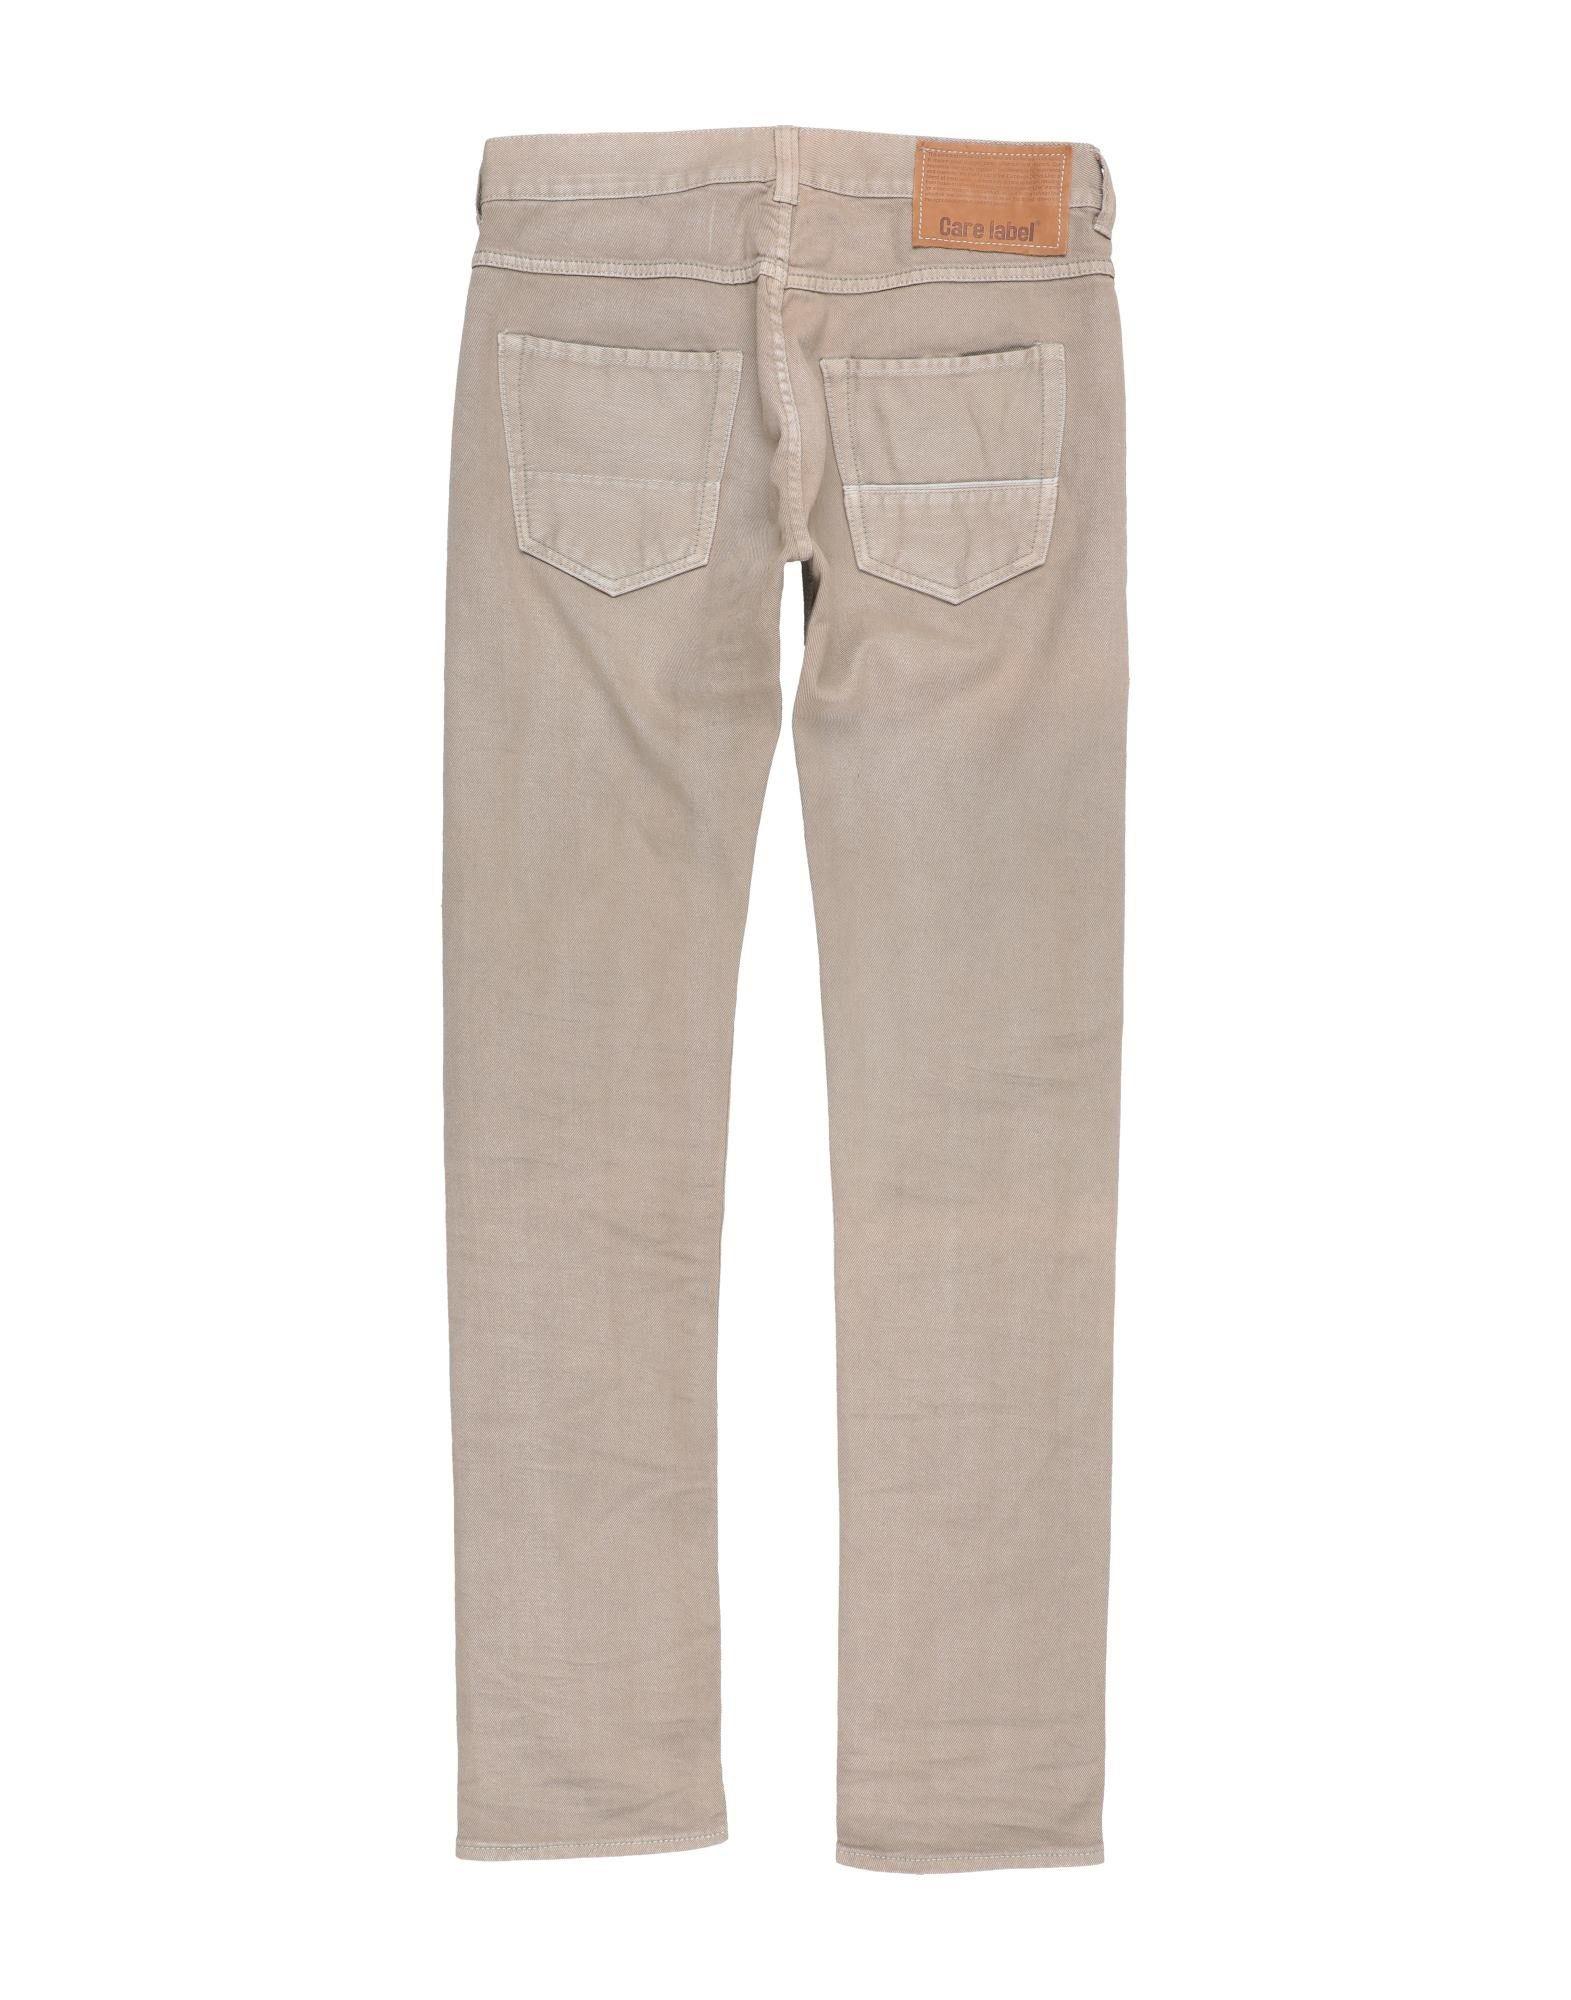 Care Label - Denim - Denim Trousers - On Yoox.com